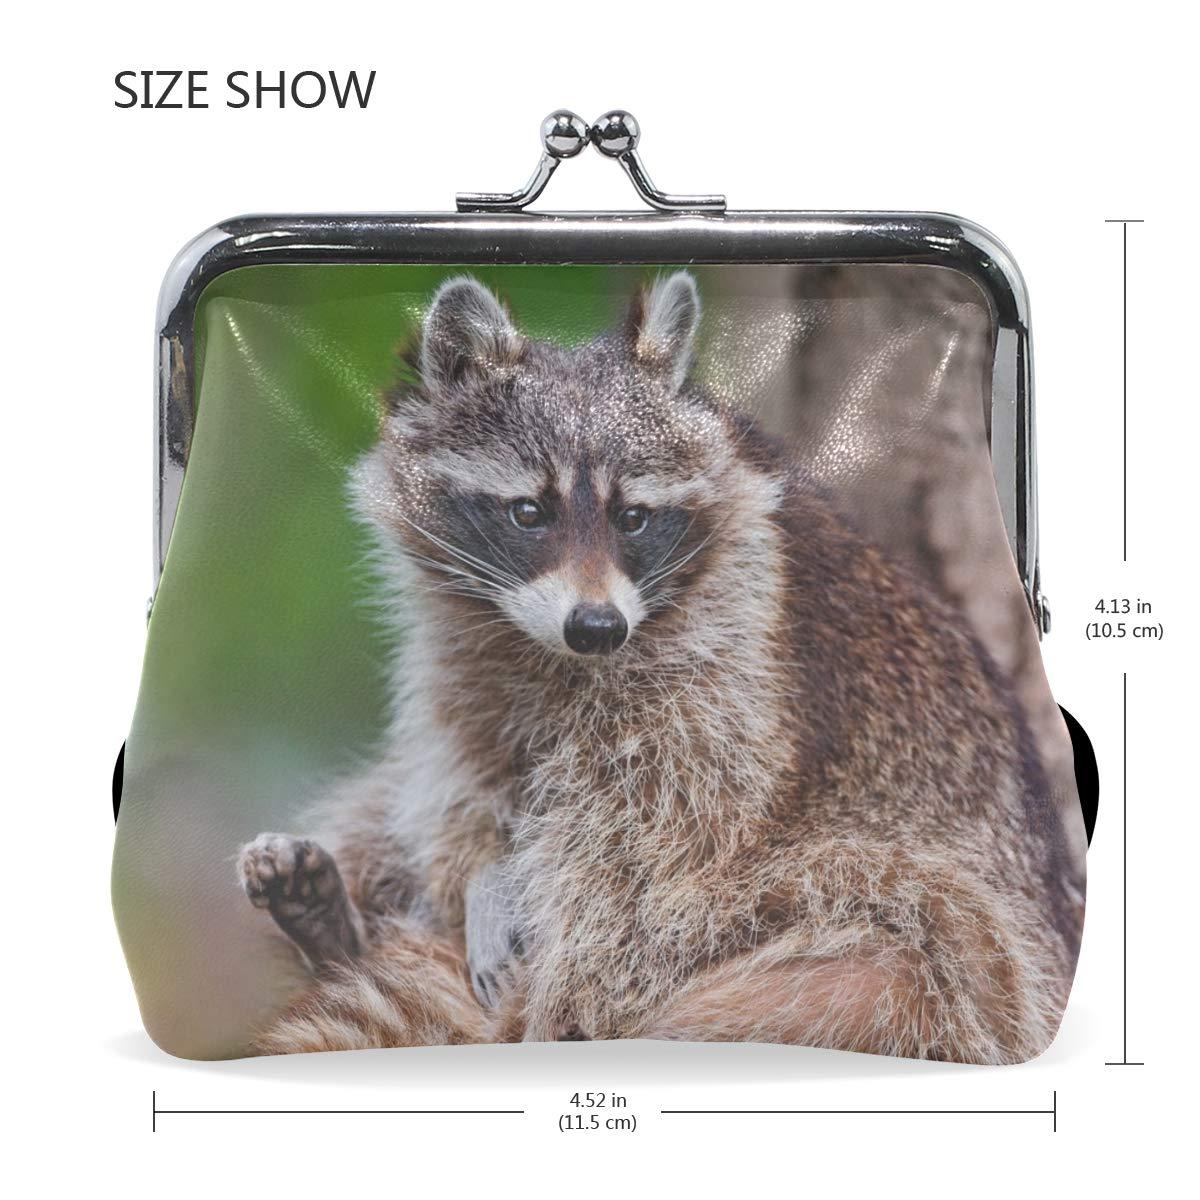 Rh Studio Coin Purse Raccoon Animal Tree Striped Print Wallet Exquisite Clasp Coin Purse Girls Women Clutch Handbag